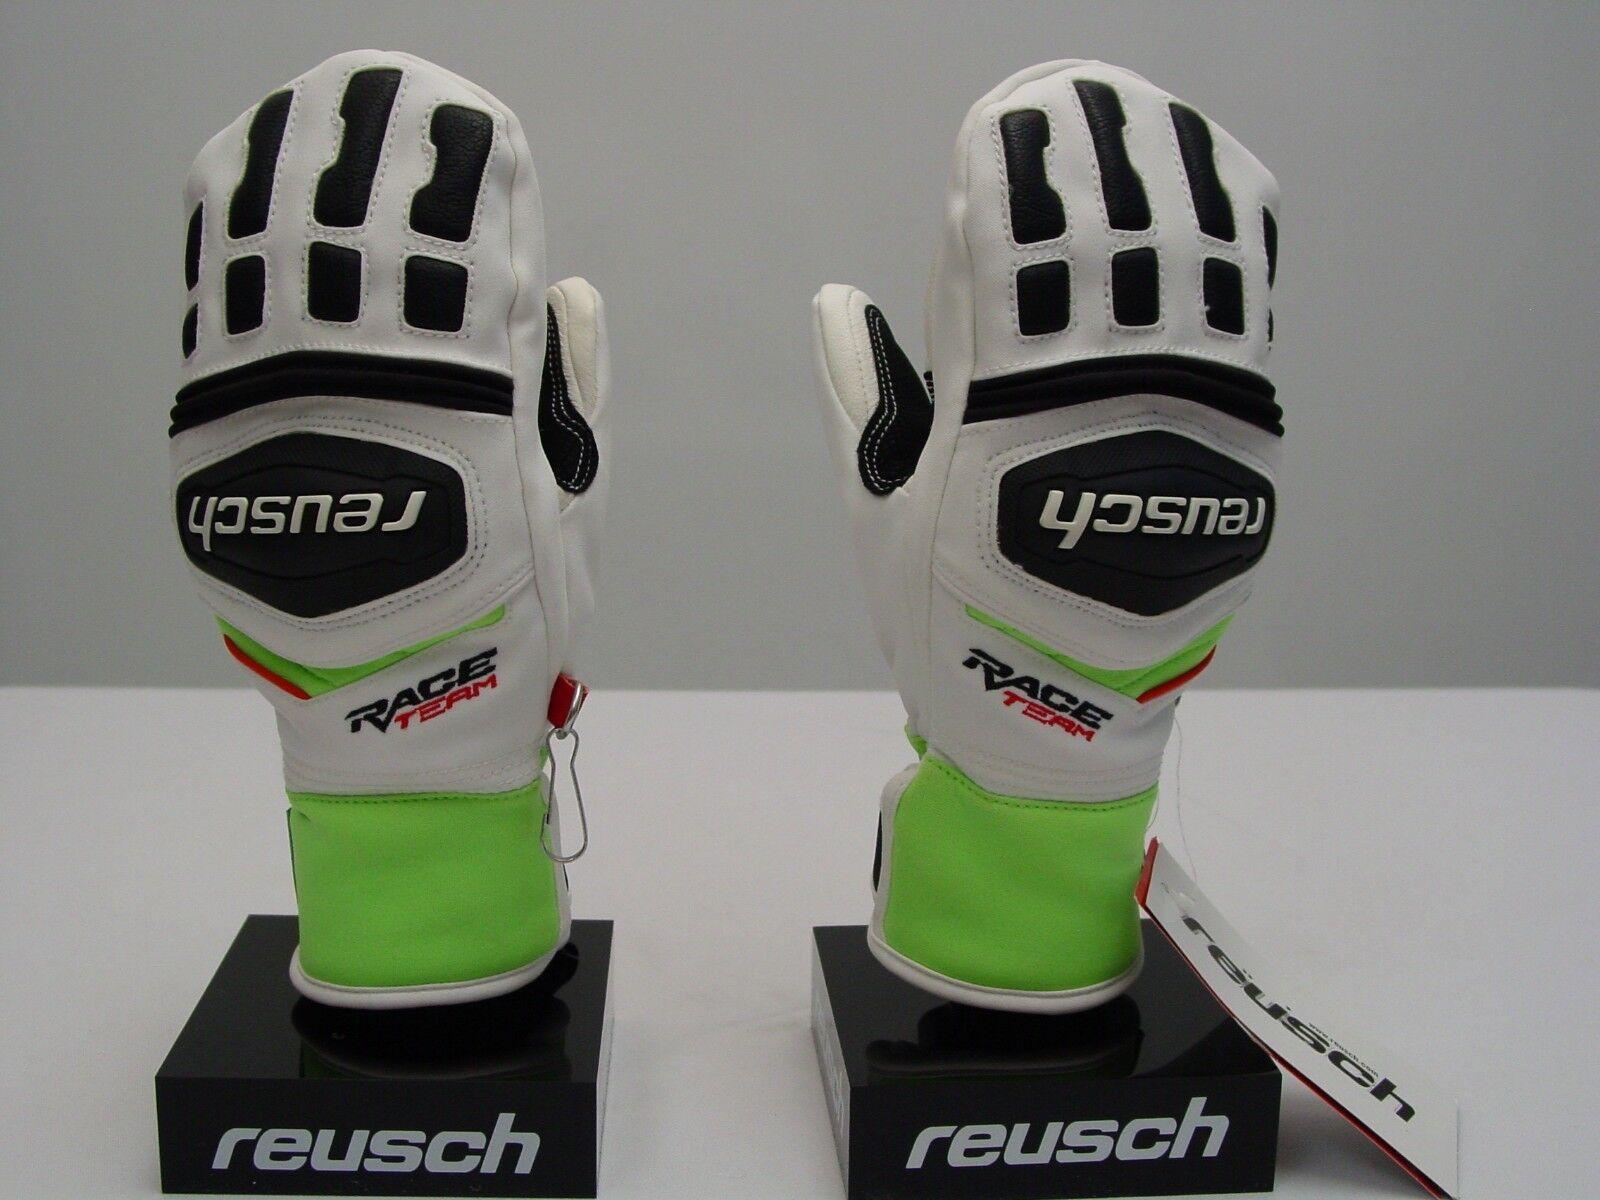 Reusch Ski Mittens Racing Training RtexXT Junior Youth Small 4671533S WATERPROOF